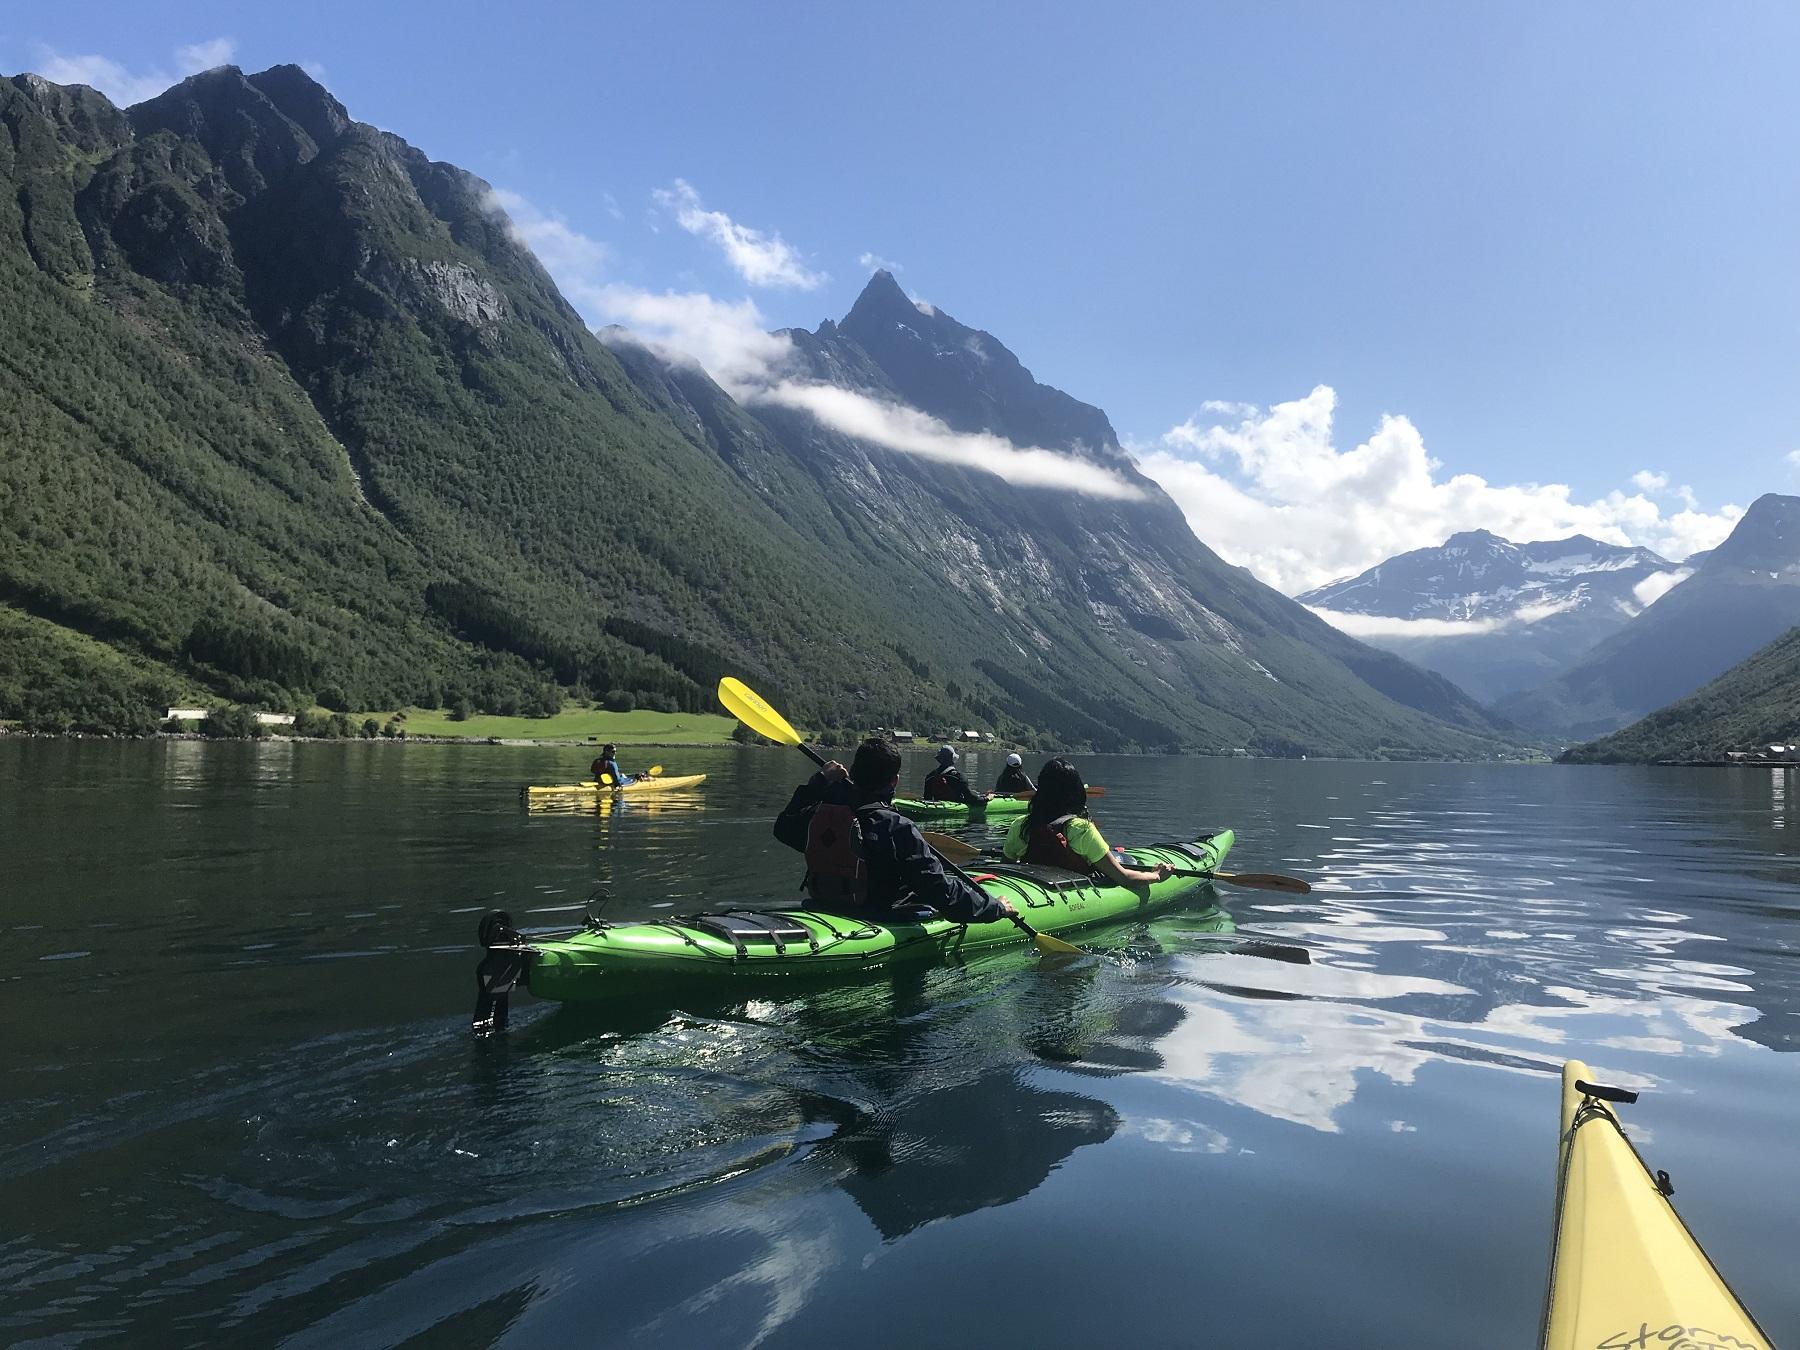 Hidden Fjord kayaking 1 day. 1